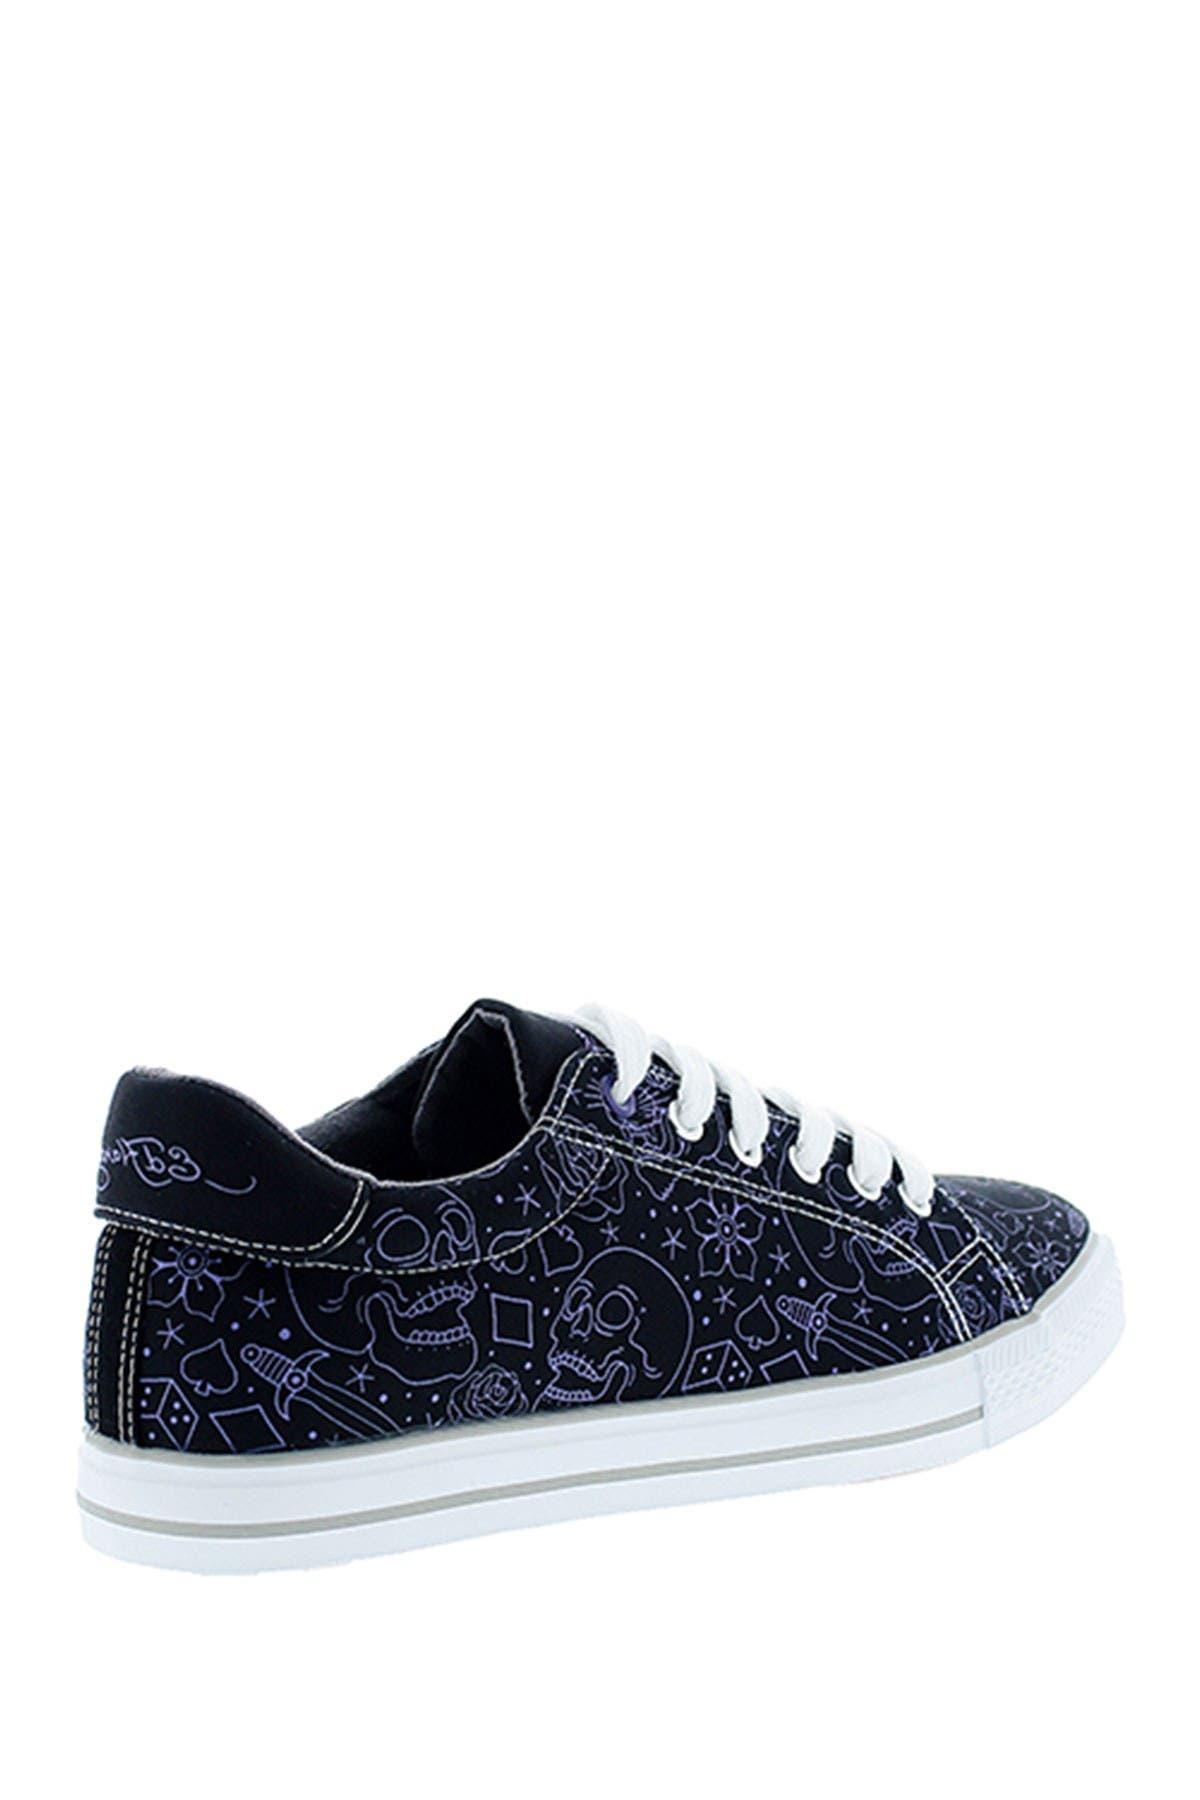 Image of Ed Hardy Star Sneaker